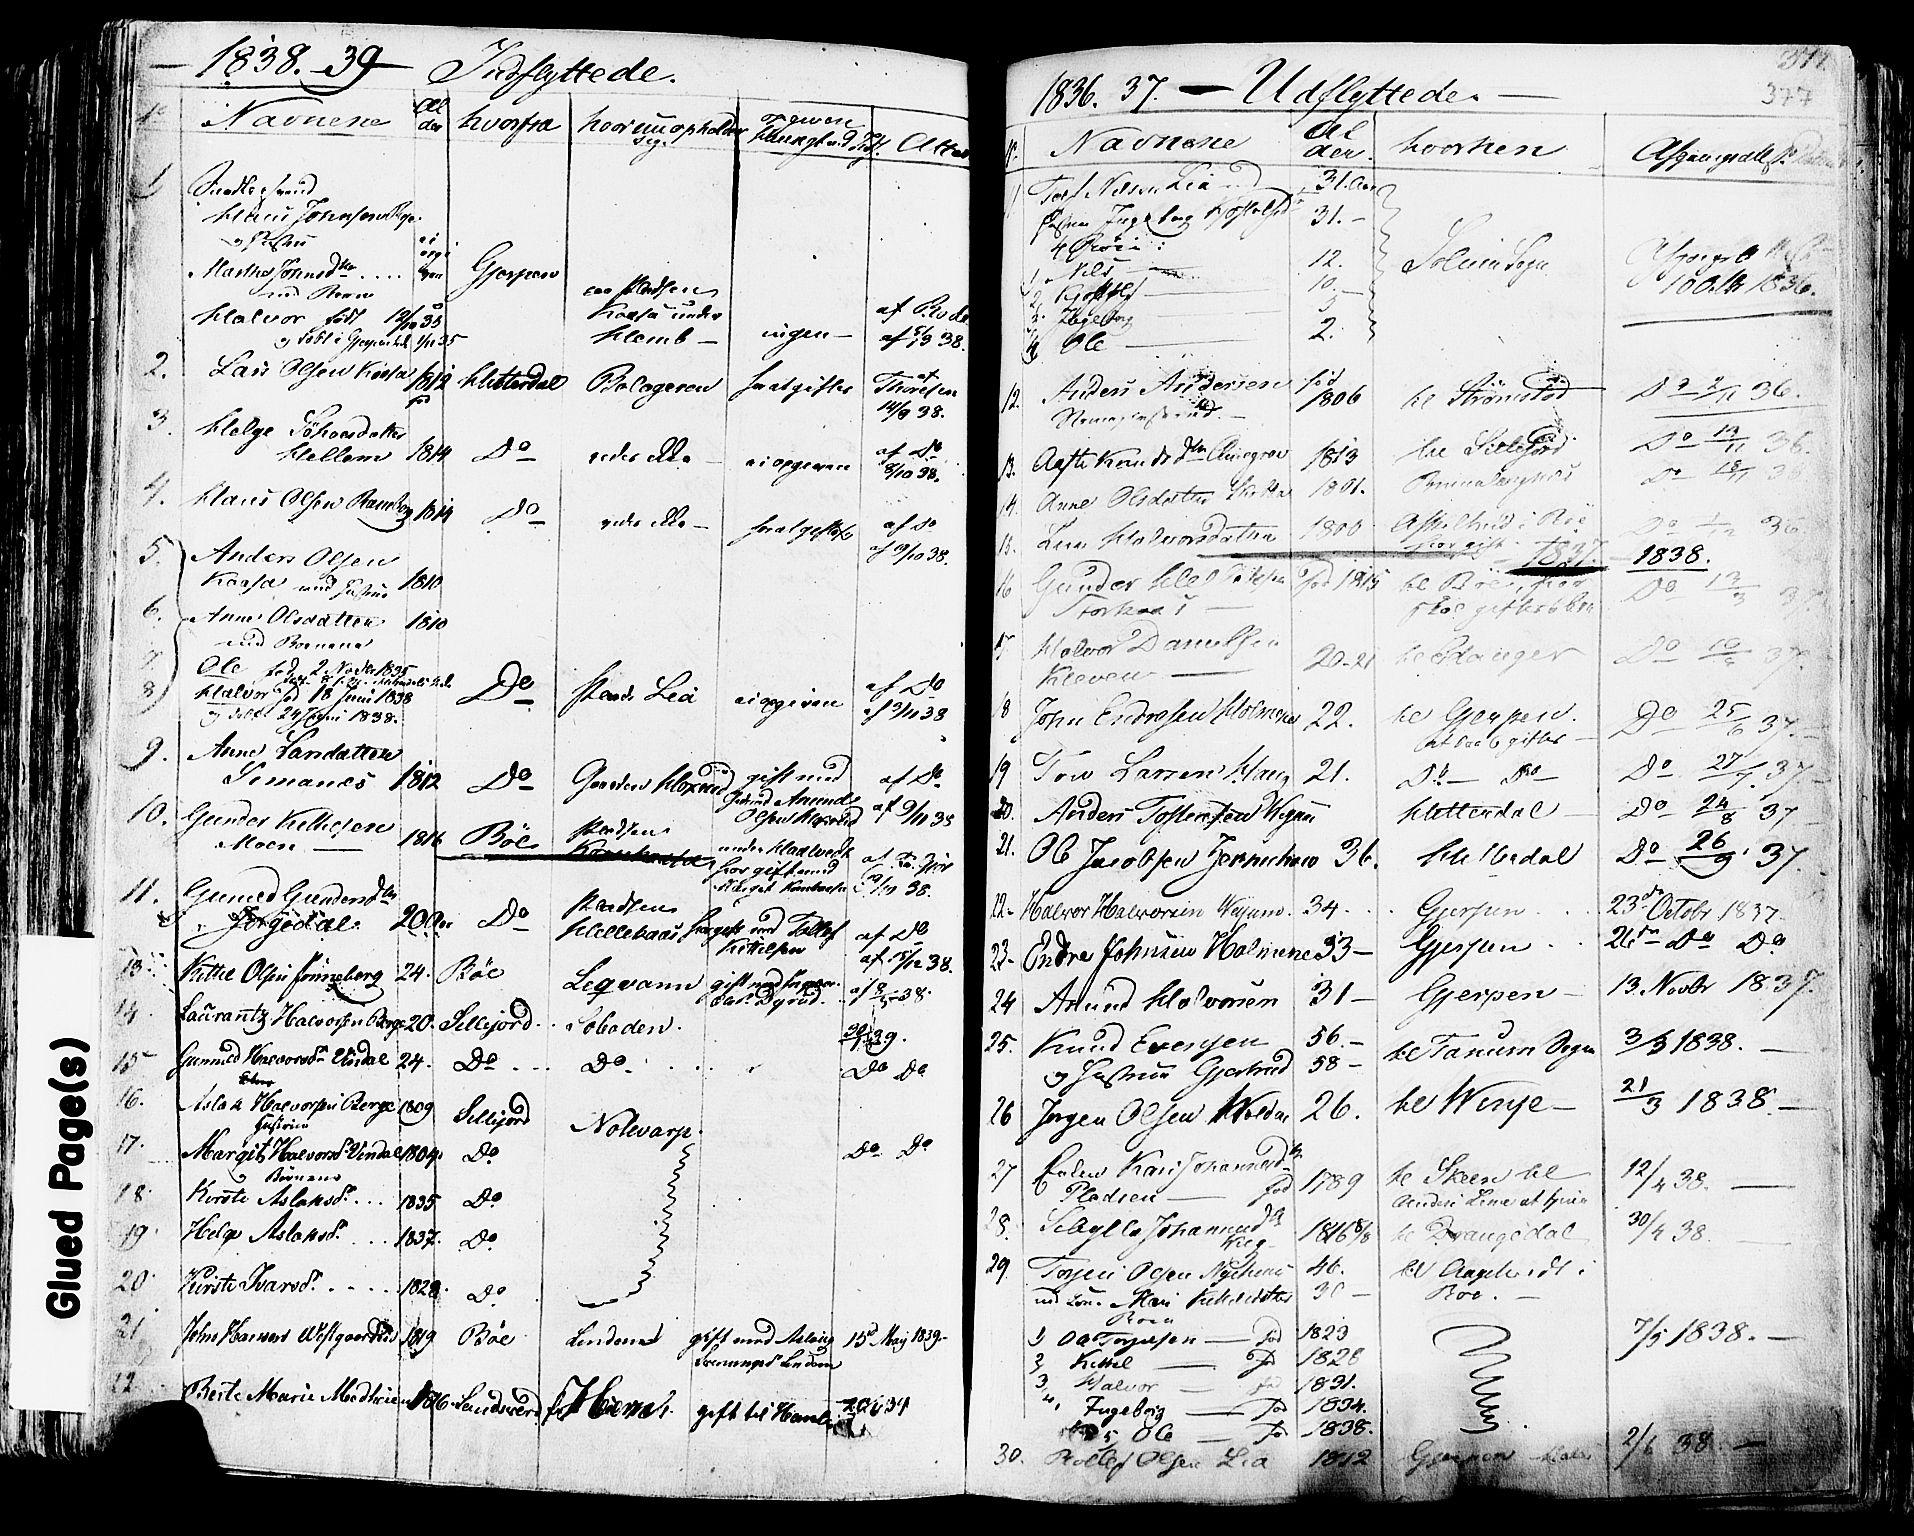 SAKO, Sauherad kirkebøker, F/Fa/L0006: Ministerialbok nr. I 6, 1827-1850, s. 377